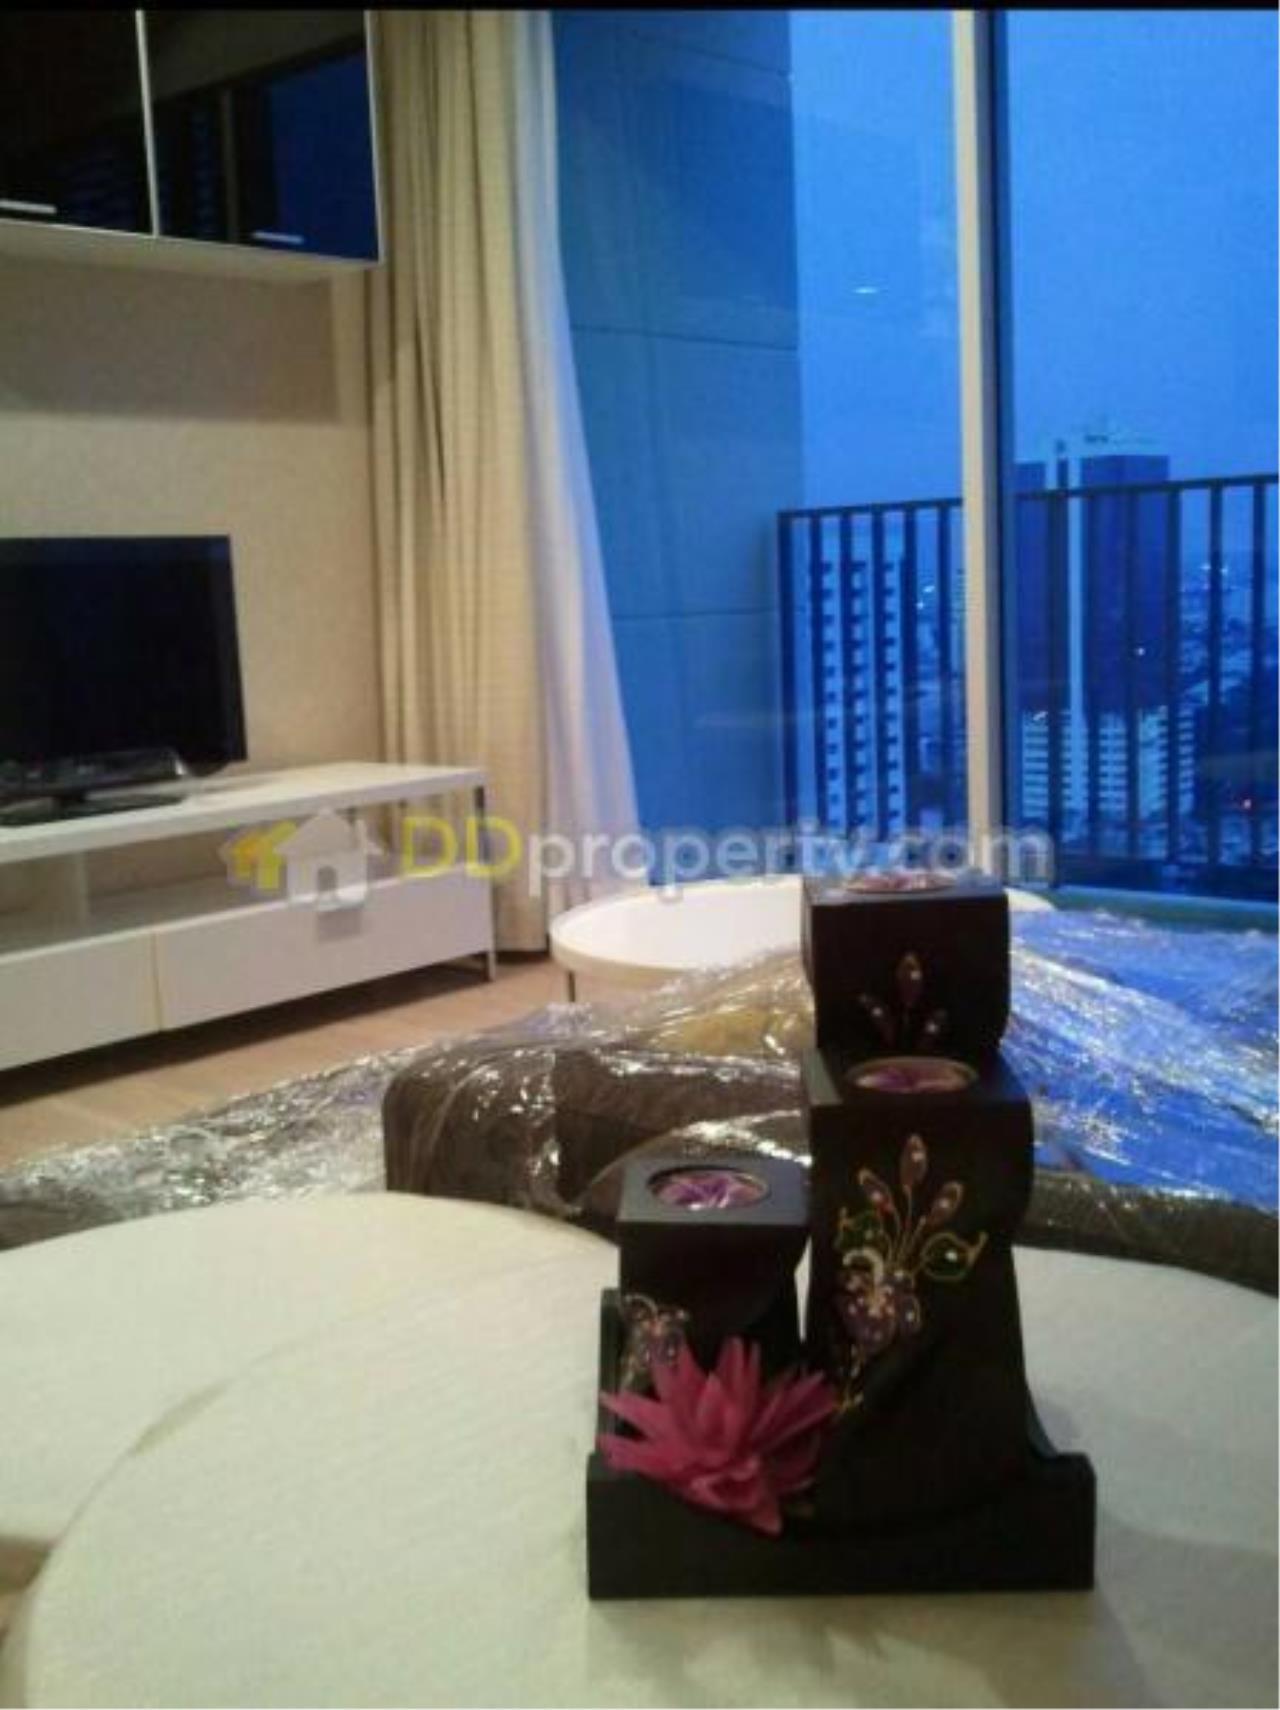 Quality Life Property Agency's For Rent Siri at Sukhumvit Condominium BTS Thonglor 3